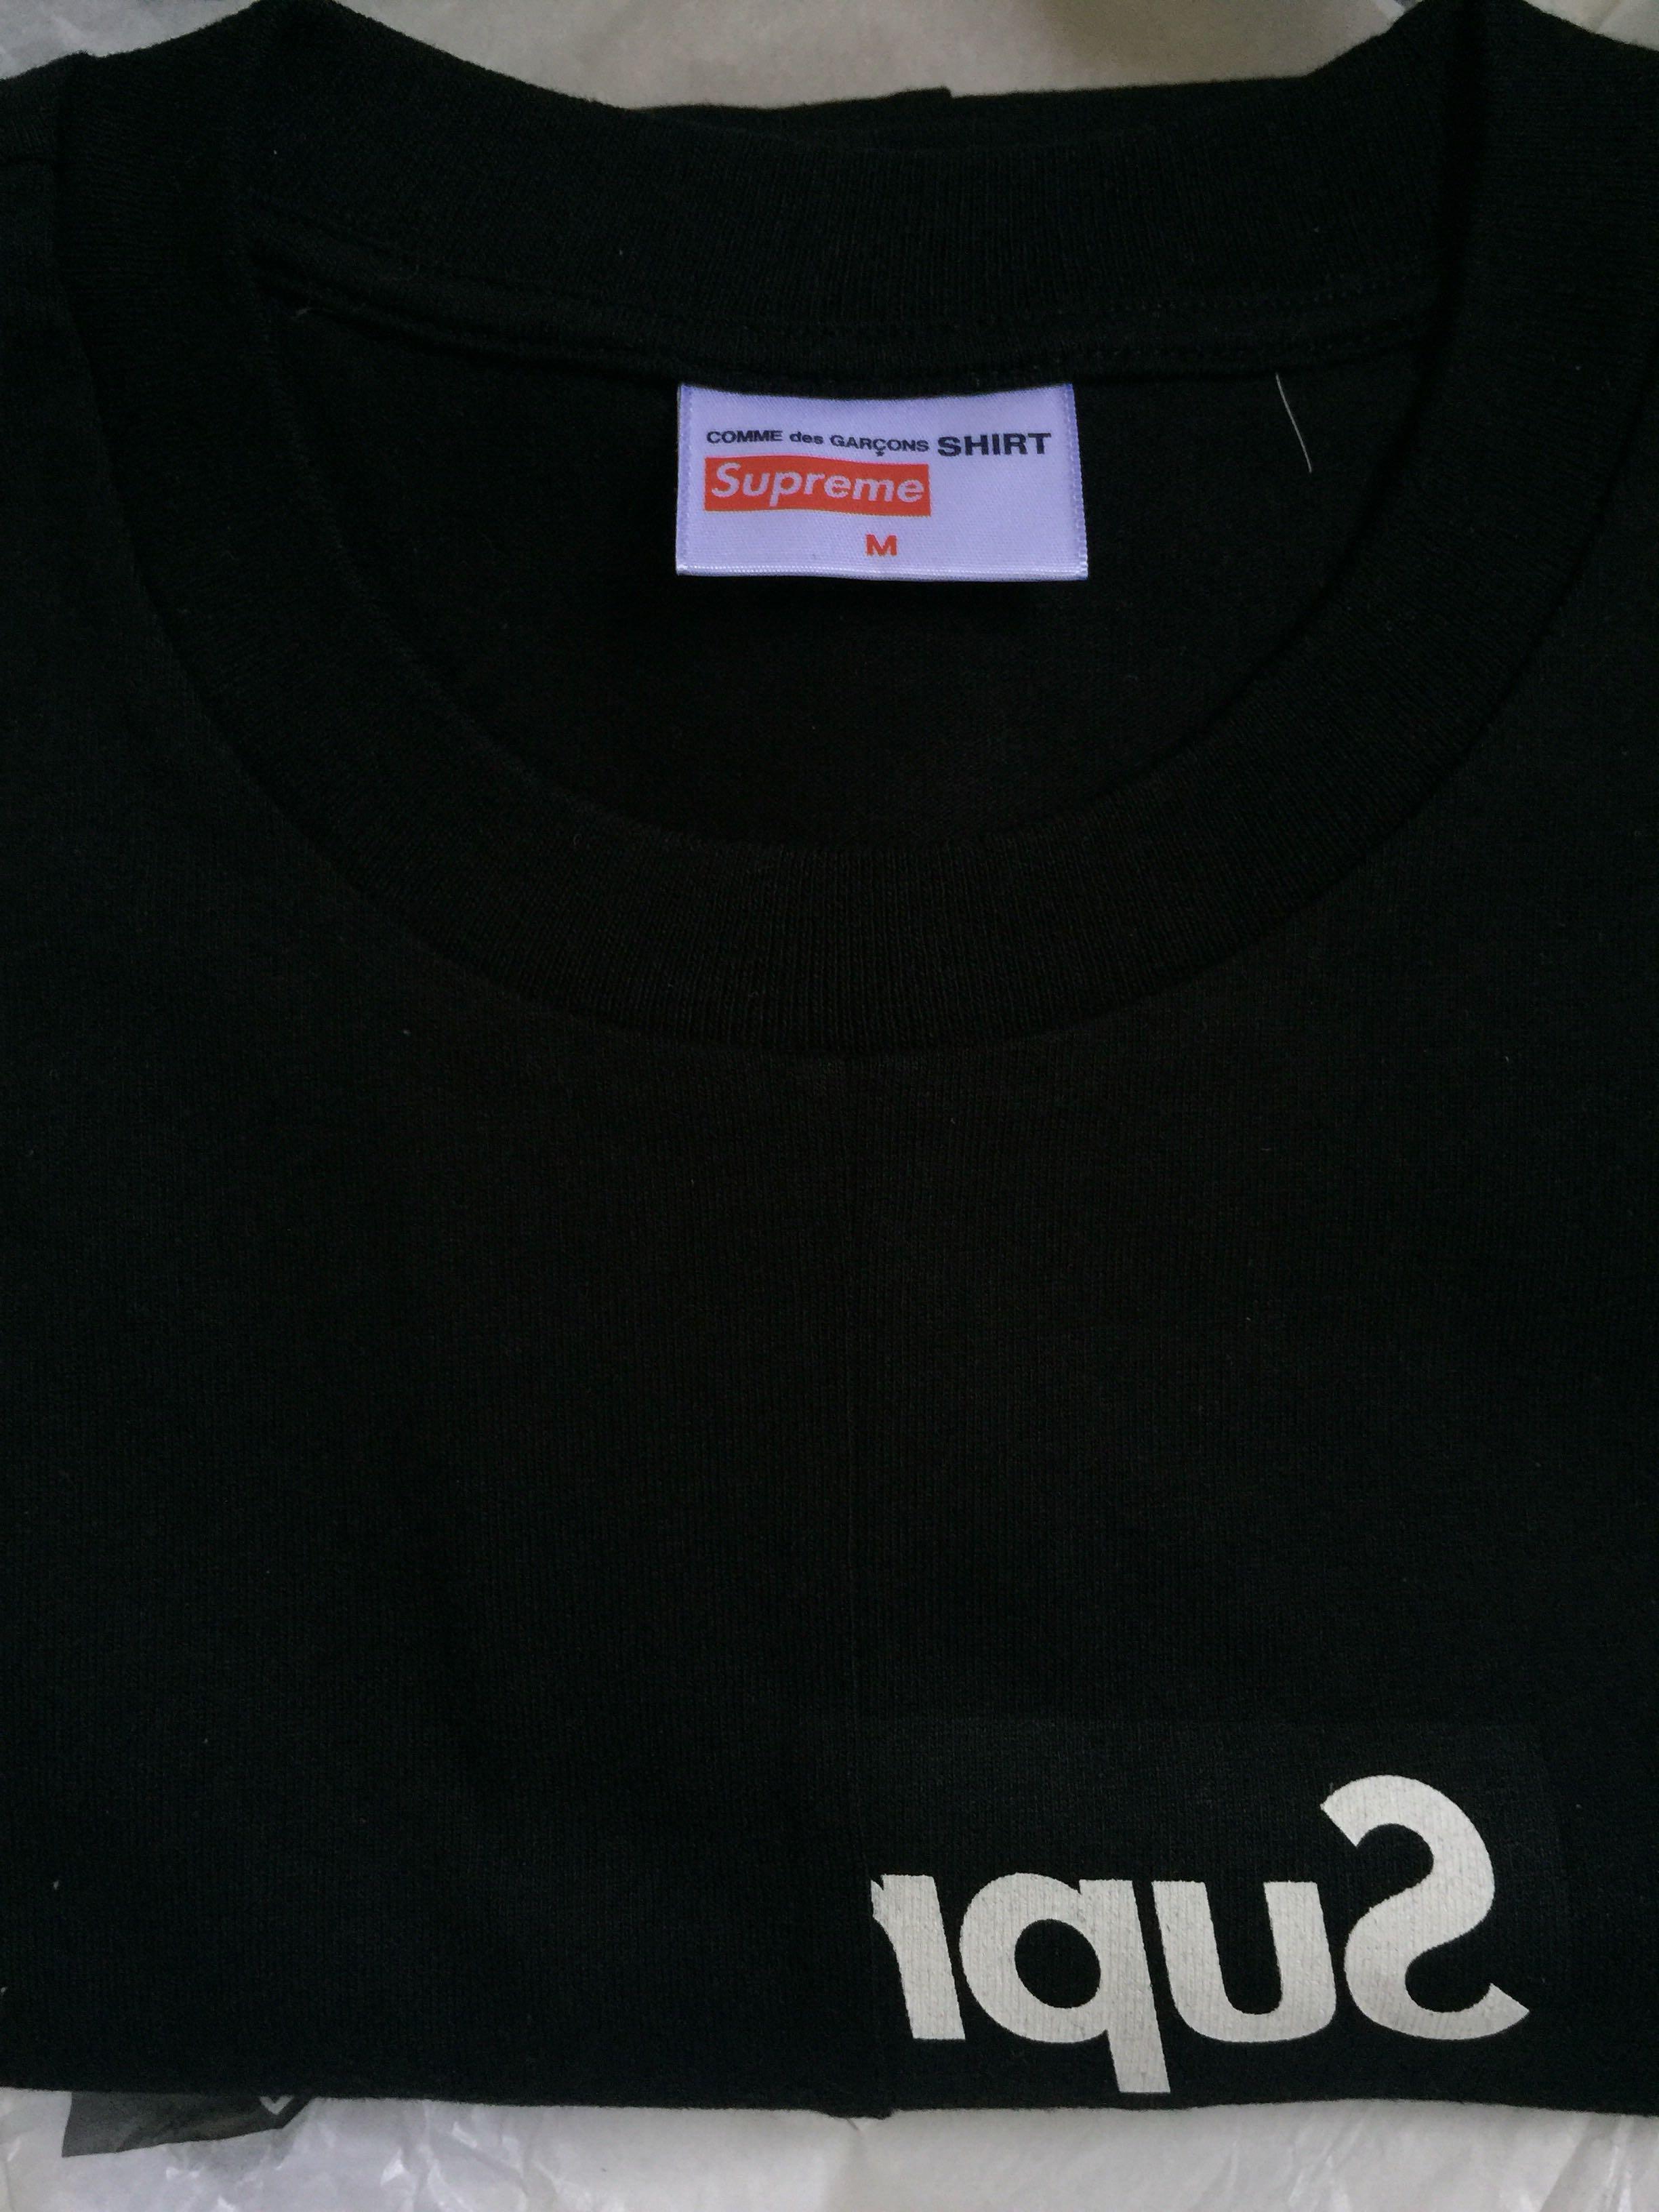 eca3a6858c7e Supreme x CDG Split Box Logo Tee Black, Men's Fashion, Clothes, Tops on  Carousell